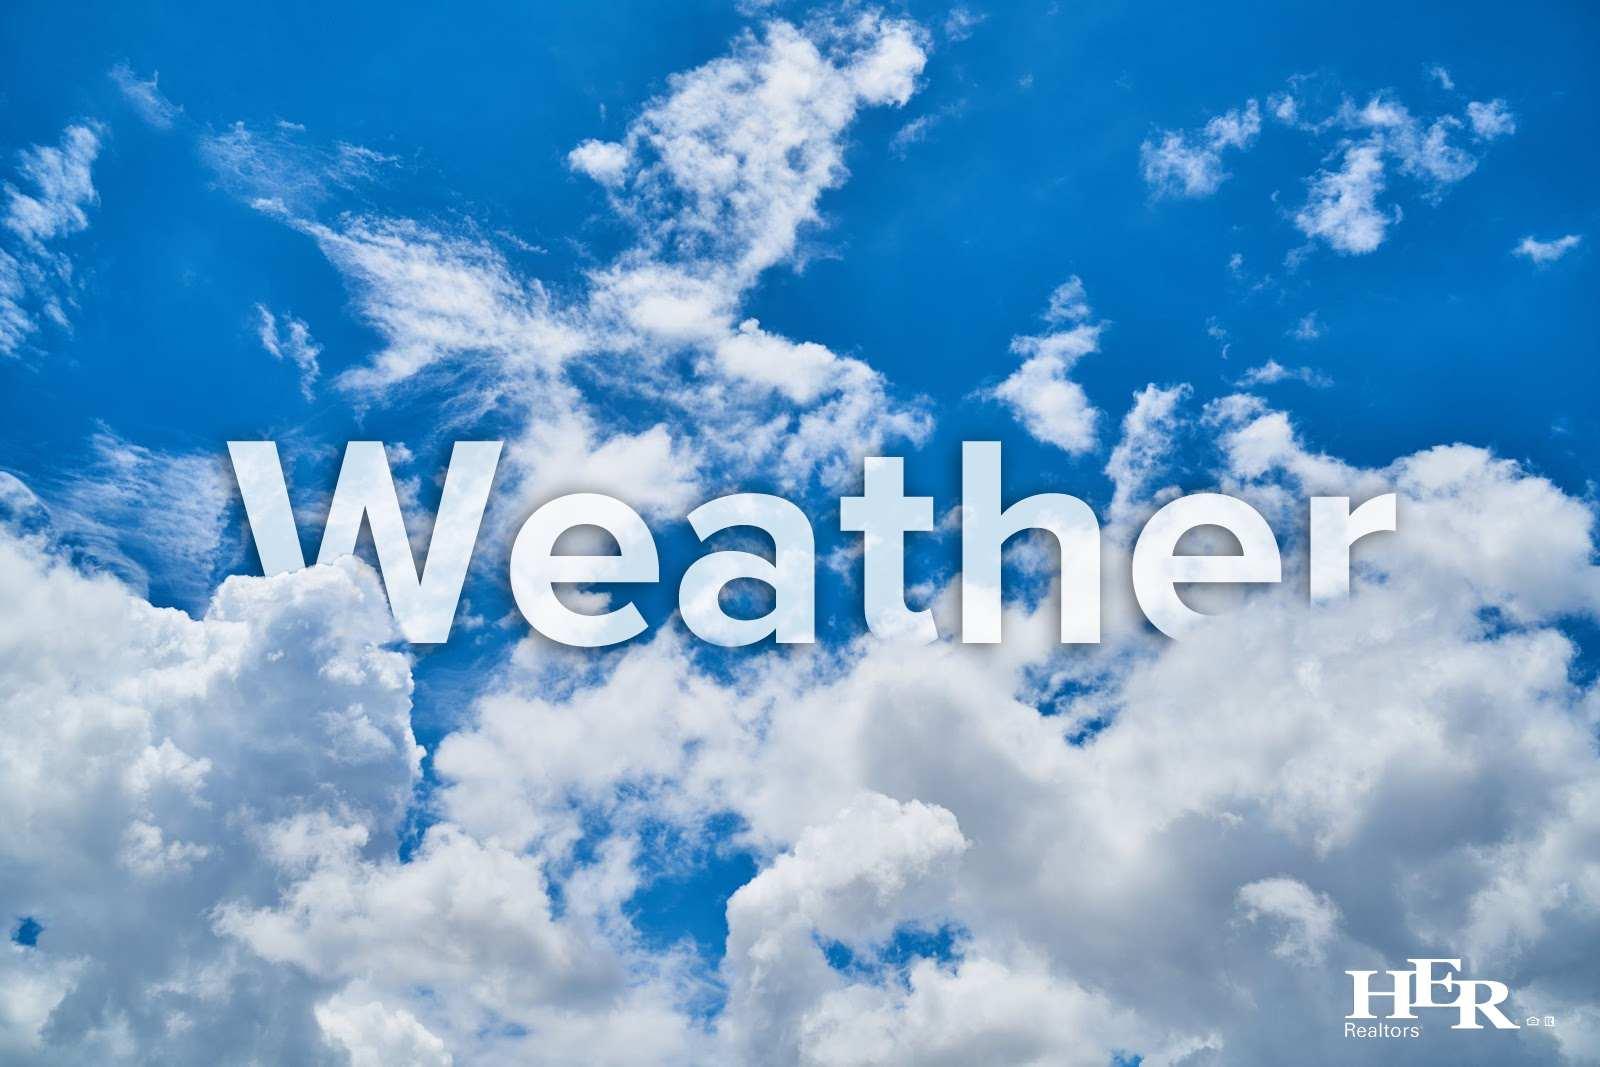 A blue, cloudy sky